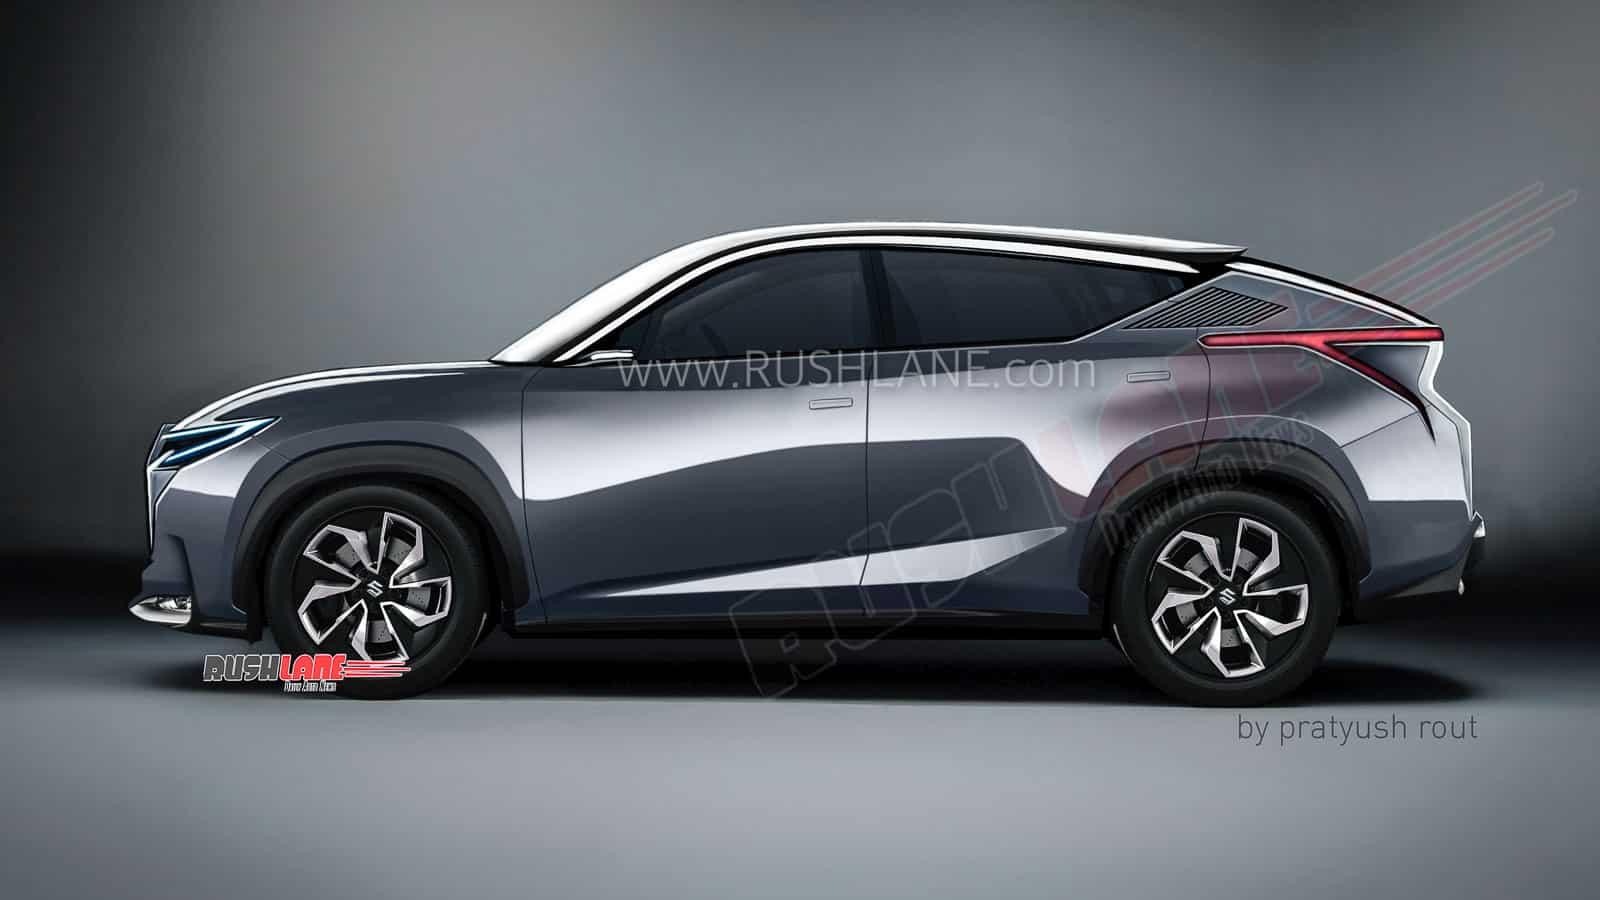 Maruti Futuro-e coupe SUV